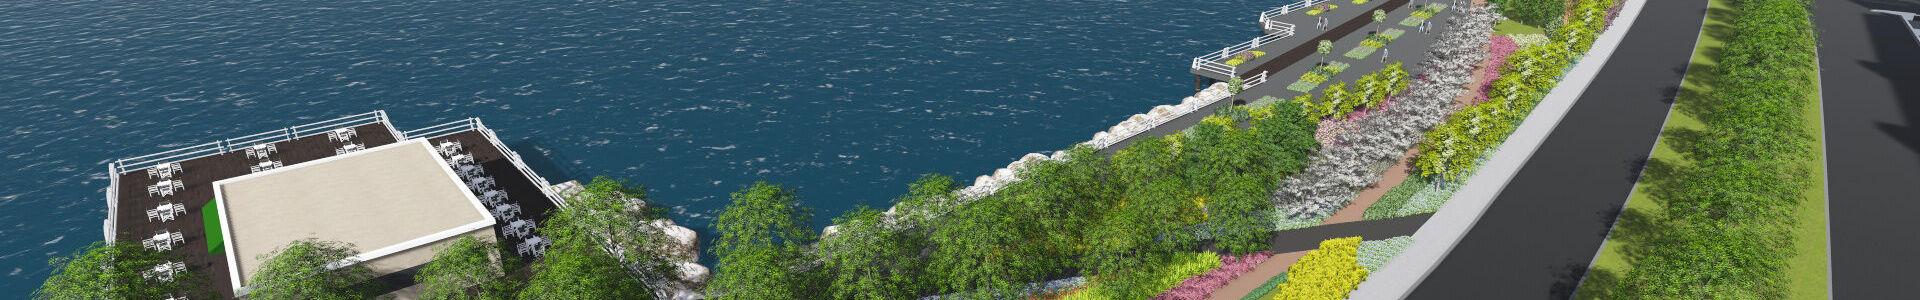 Tuzla Coastal Arrangement Project